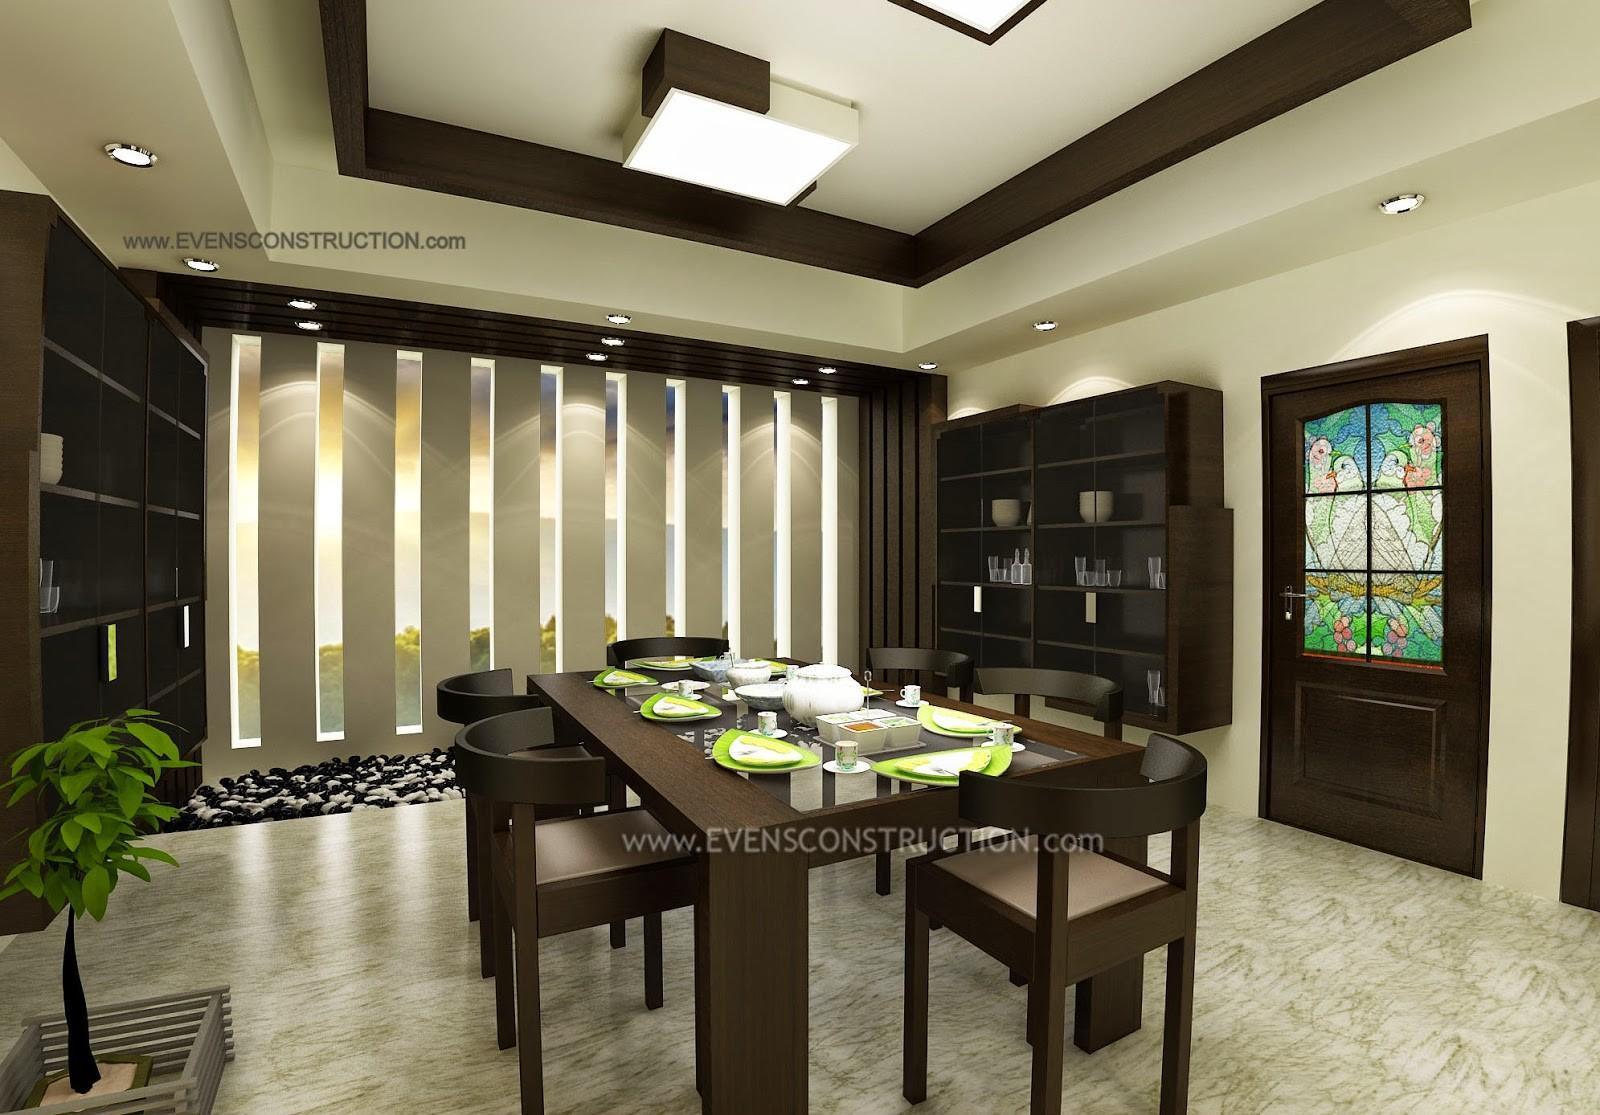 Beautiful Modern Dining Room Wall Decor Ideas Small Decoratorist 135134